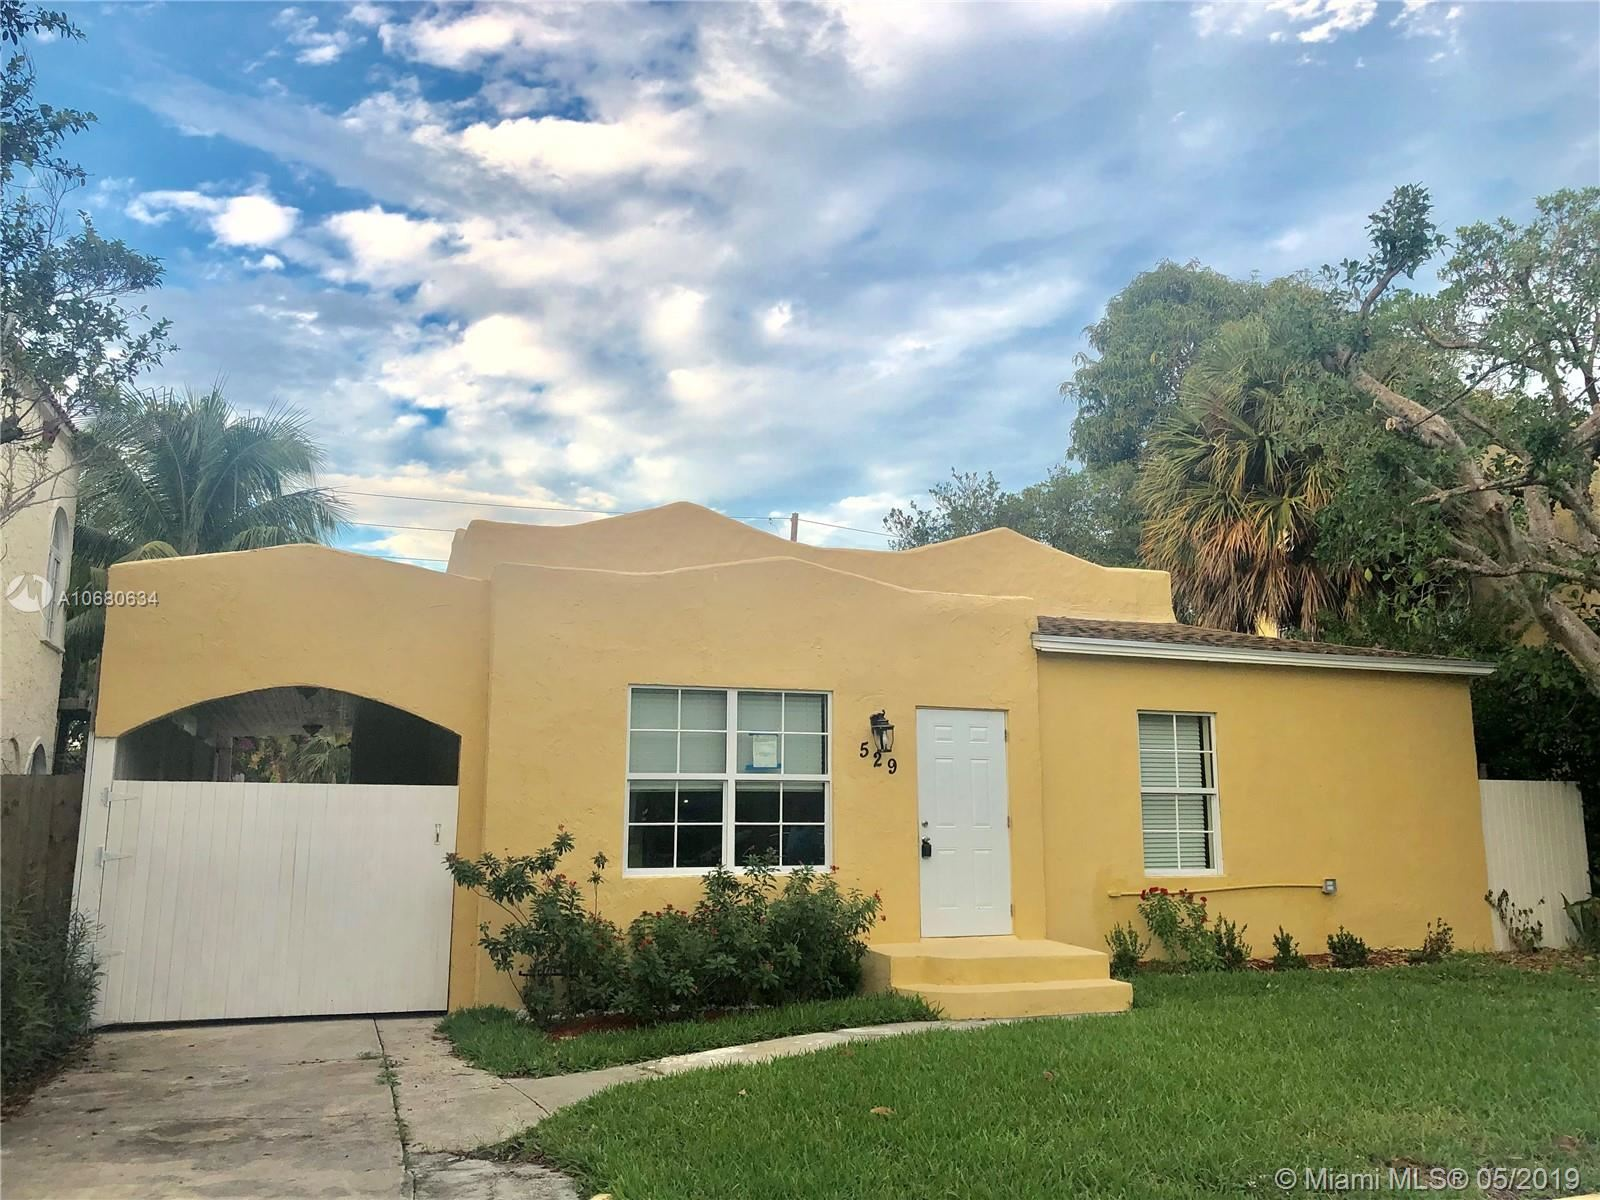 529 39th St, West Palm Beach, FL 33407 - MLS#: A10680634